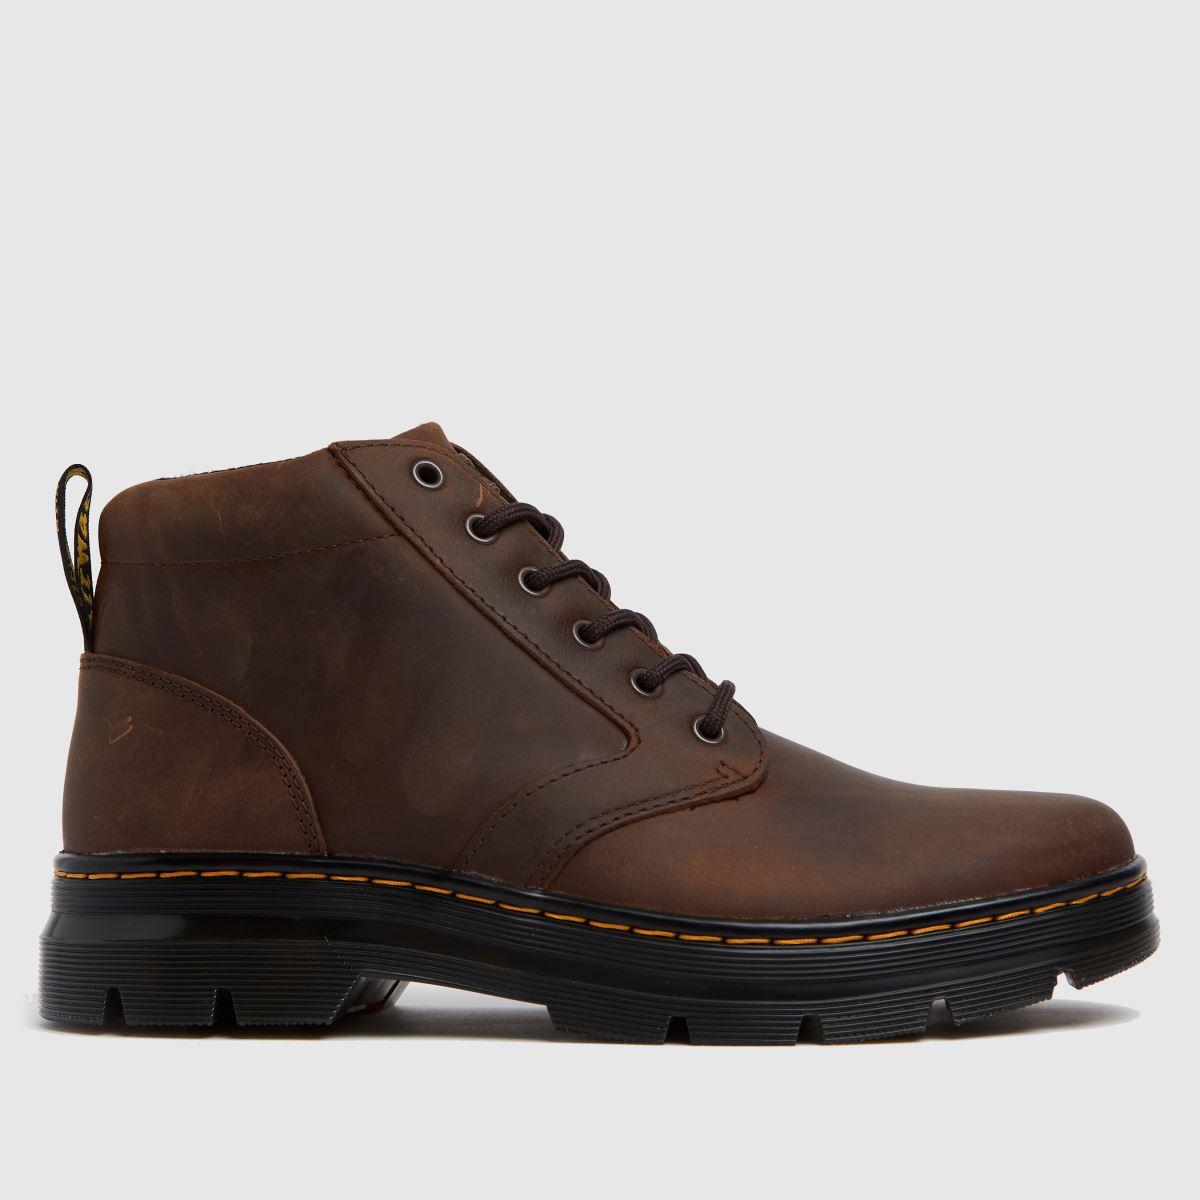 Dr Martens Brown Bonny Leather Boots